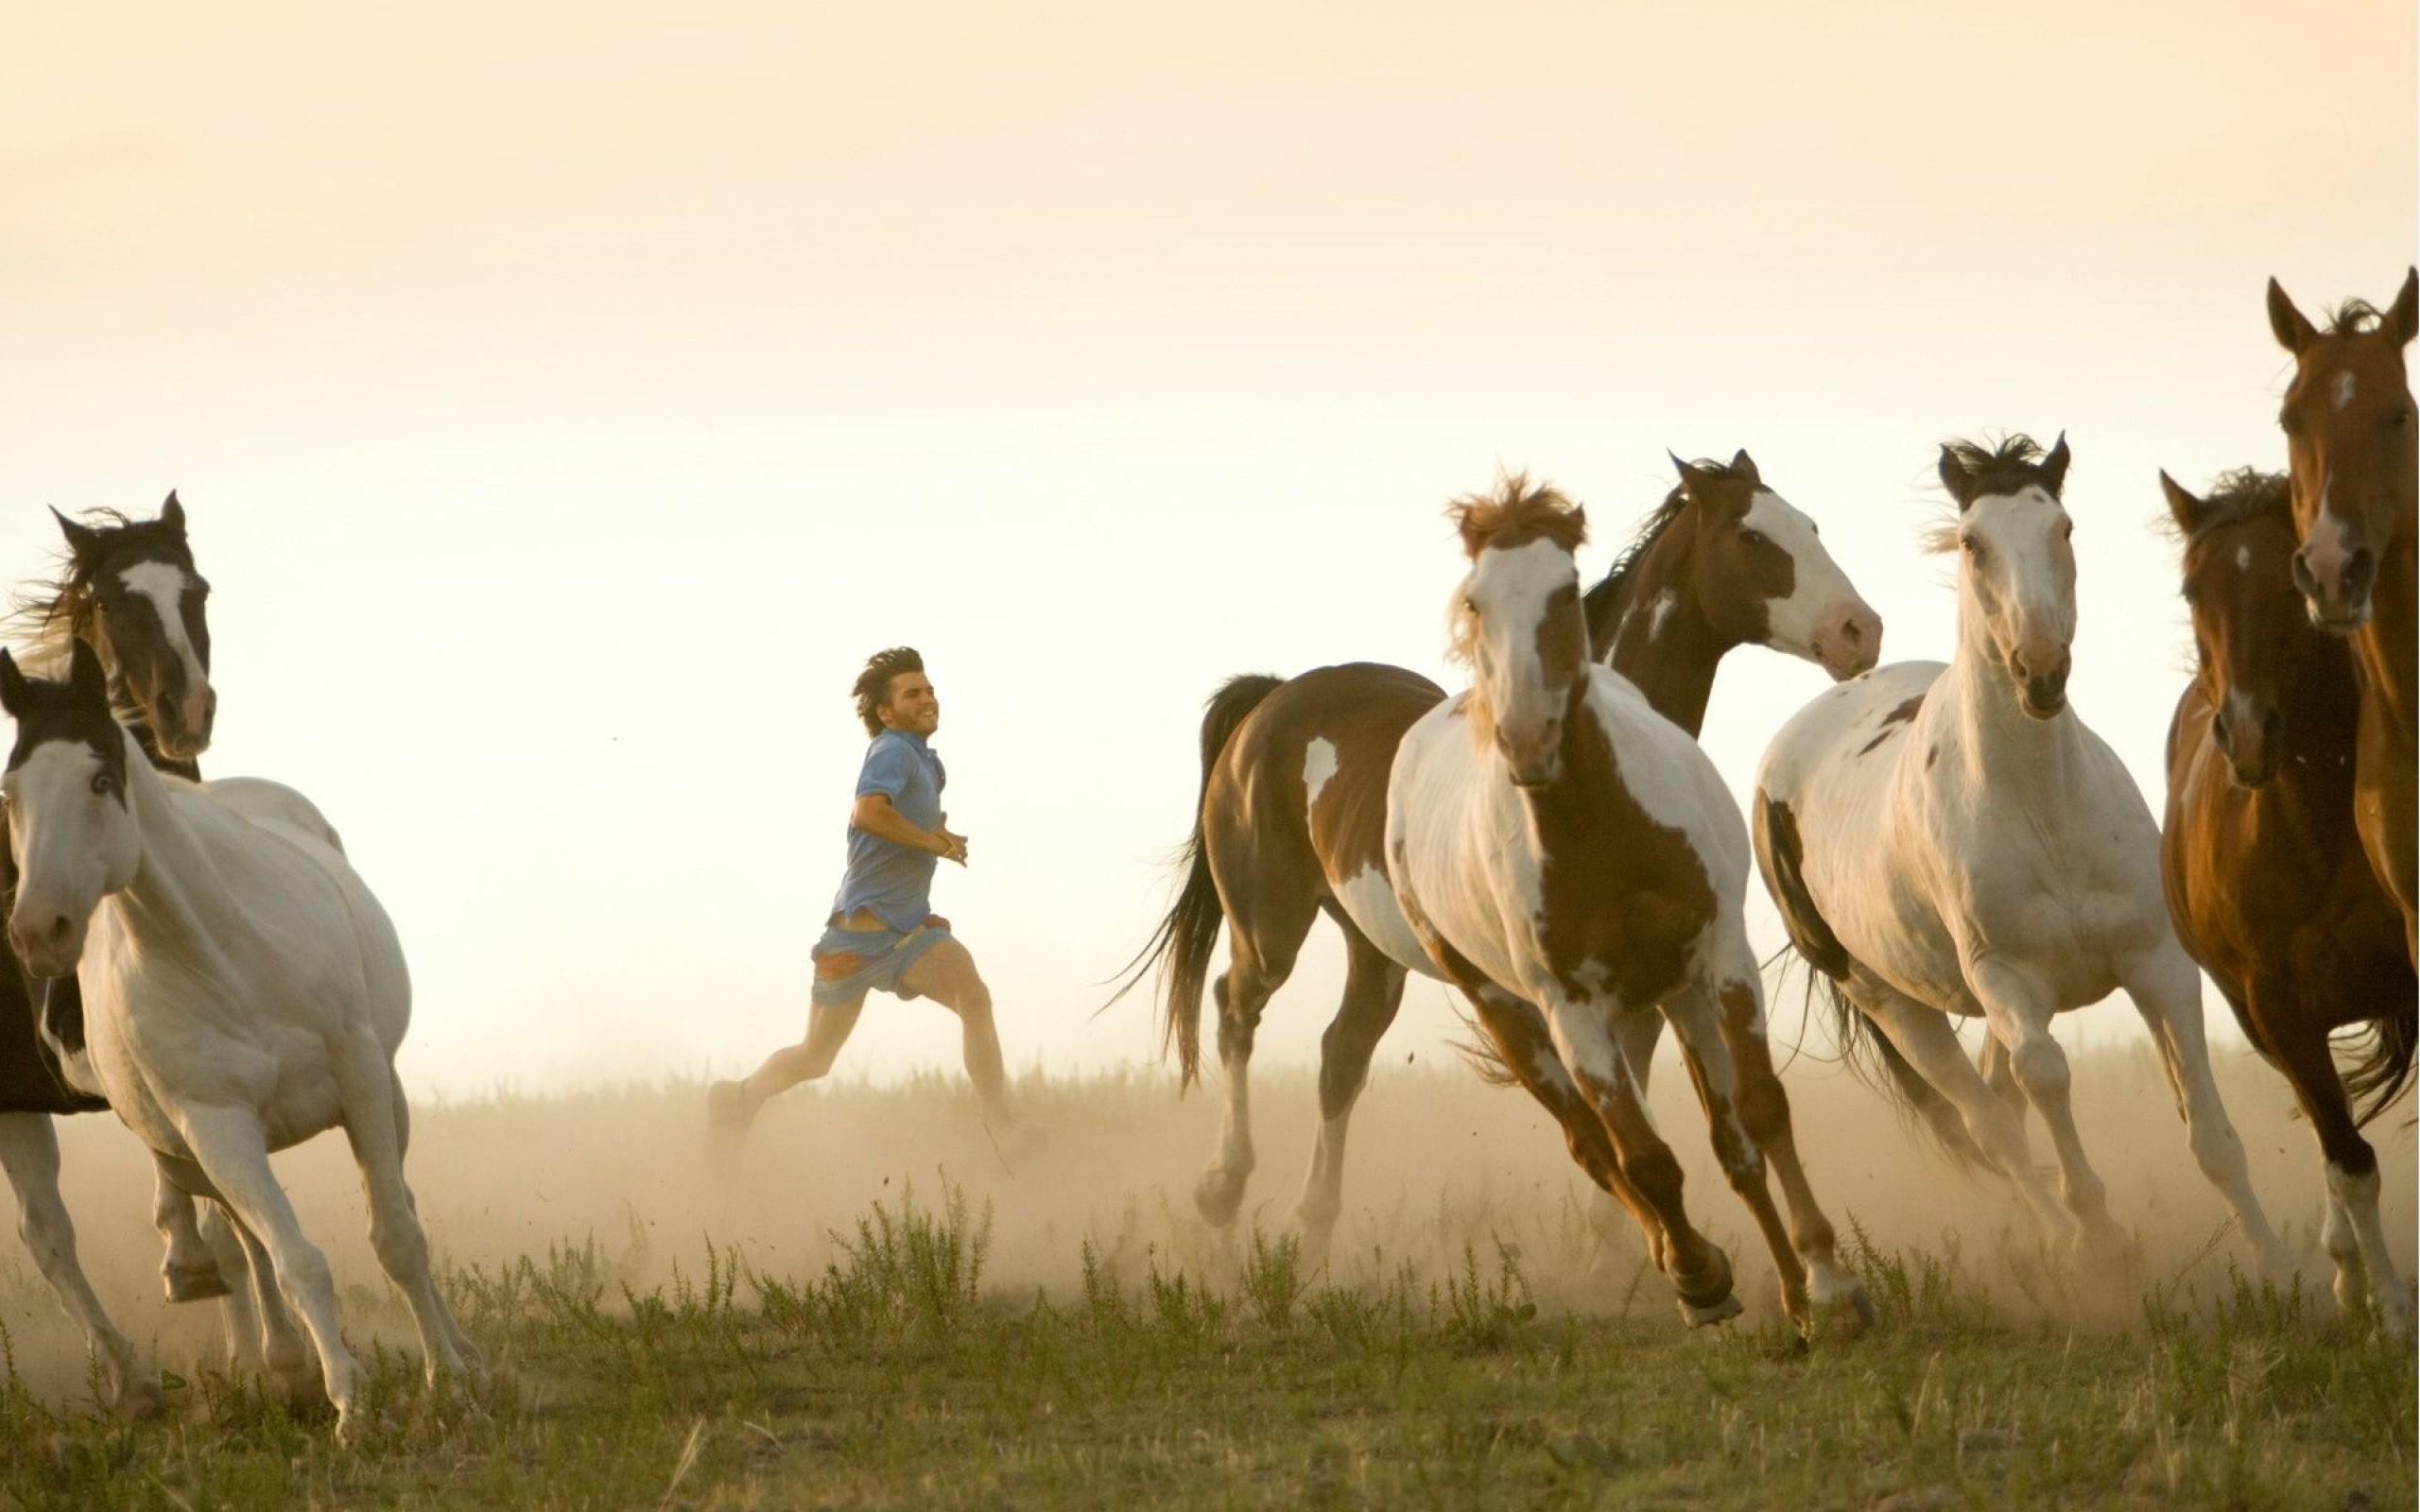 into-the-wild-emile-hirsch-actor-horse-herd2-1600x2560